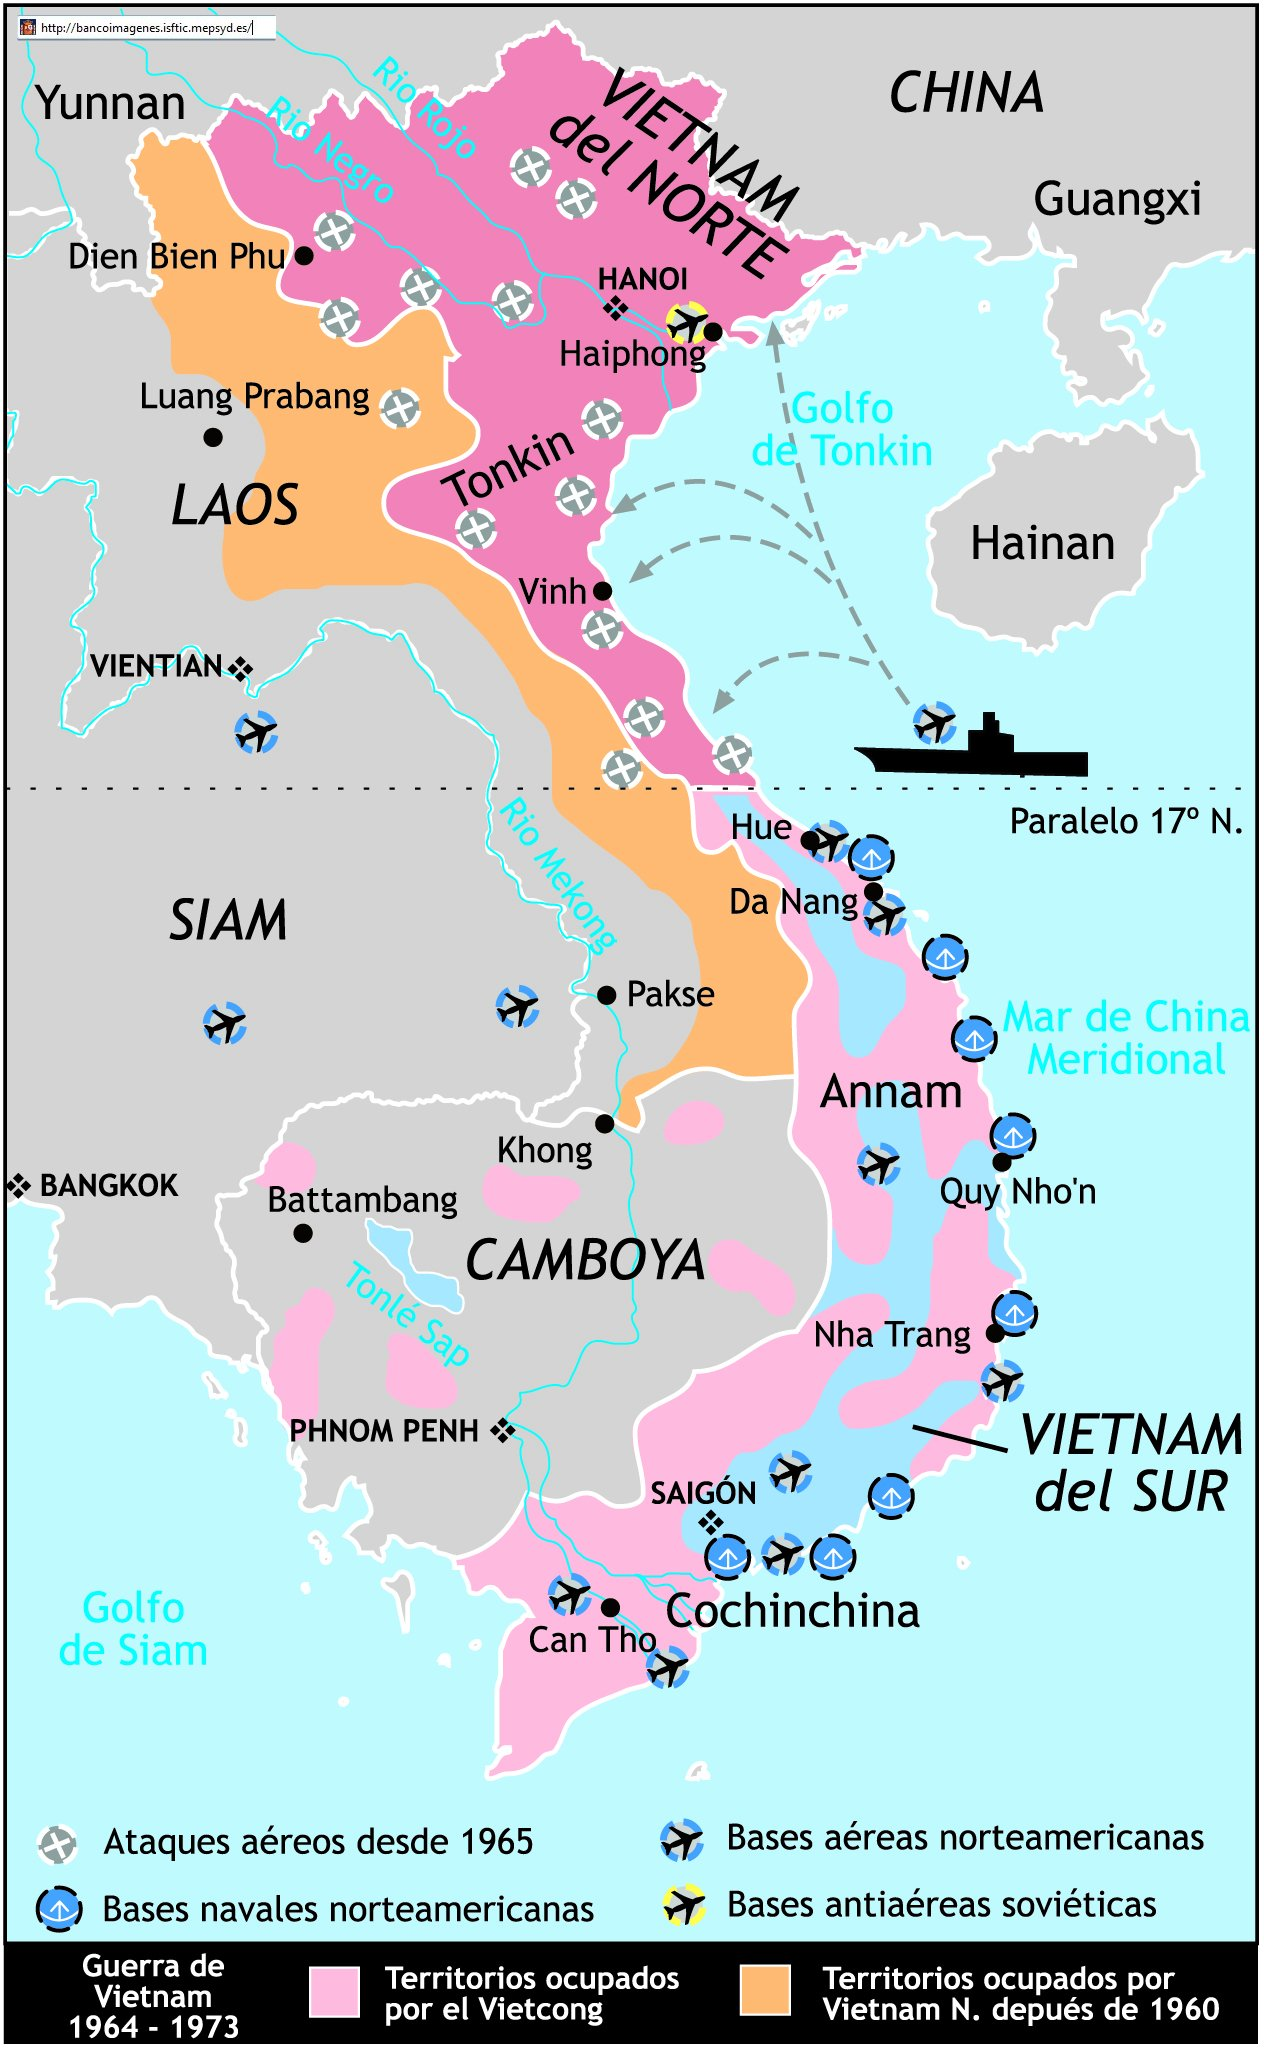 Guerra De Vietnam Mapa.Resumen La Guerra De Vietnam 1959 1975 Historia Belica